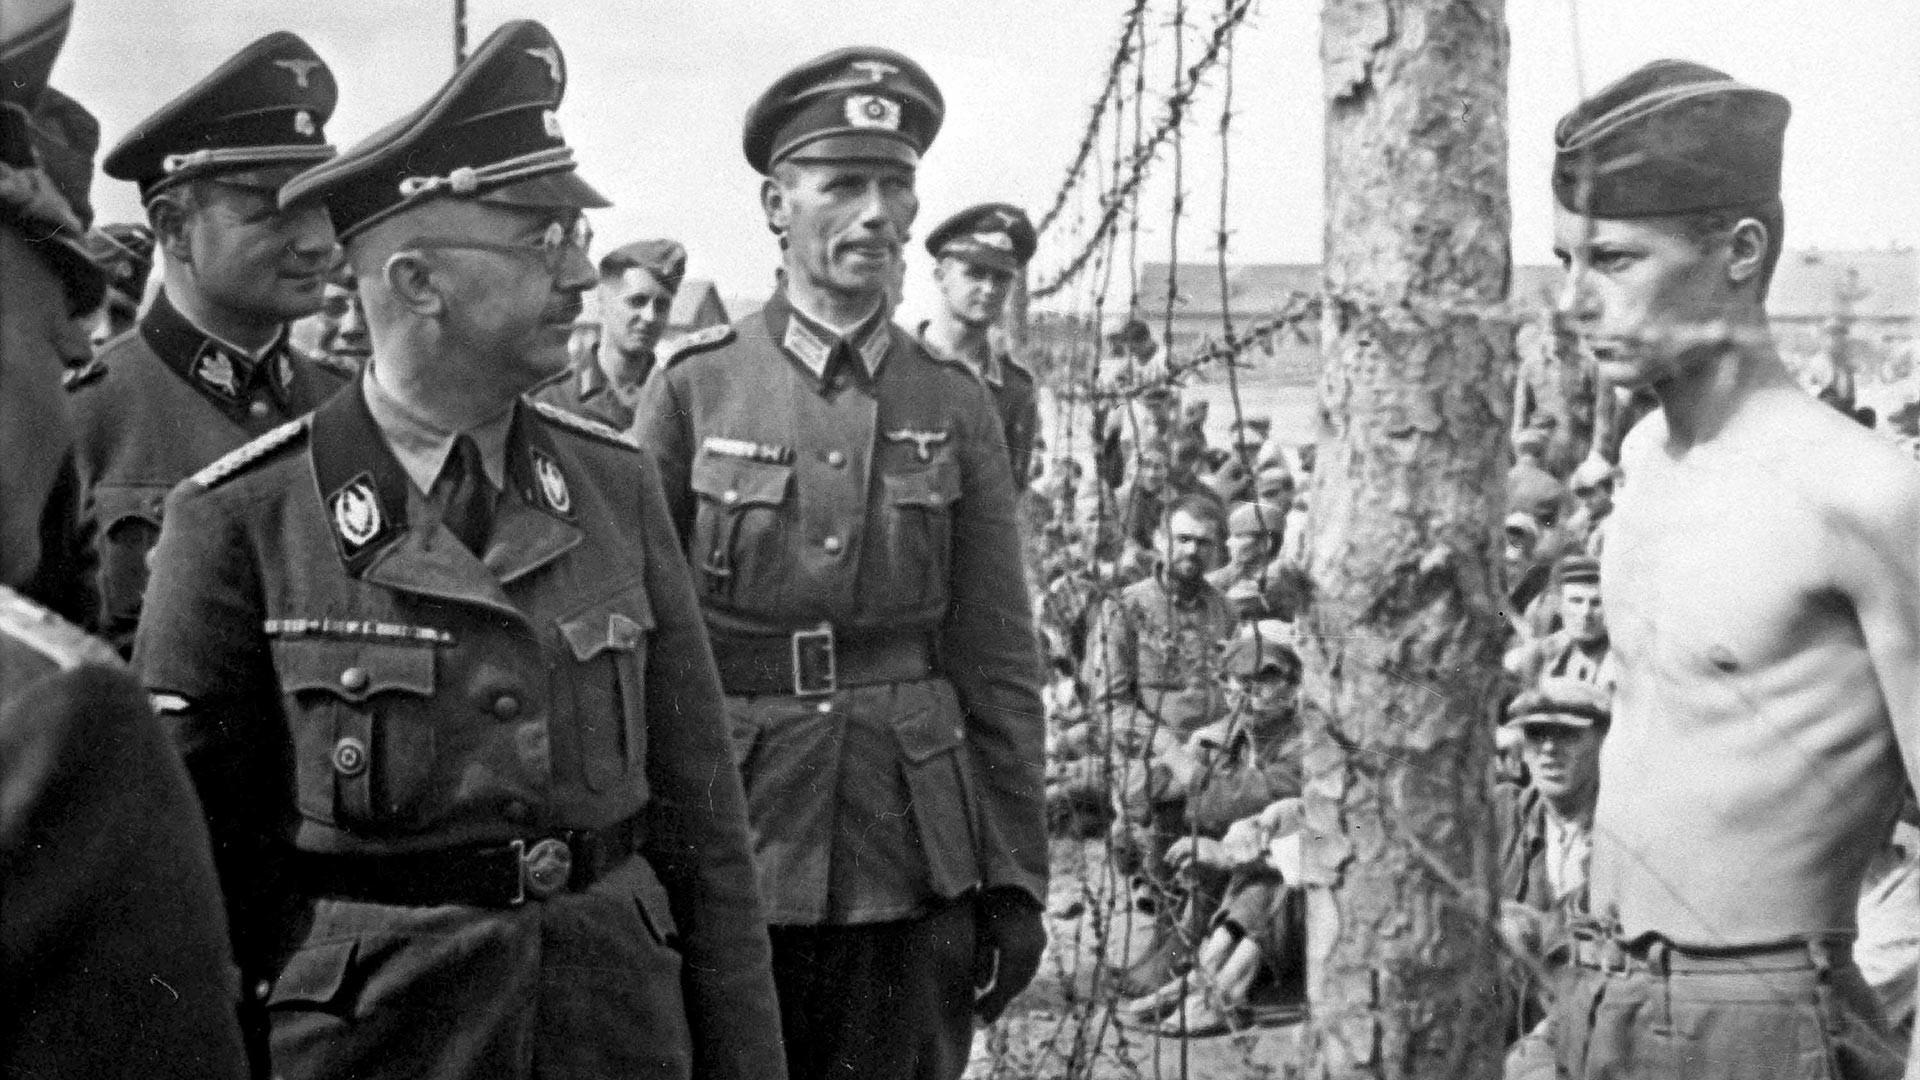 Heinrich Himmler visits a camp with Soviet prisoners of war in 1942.